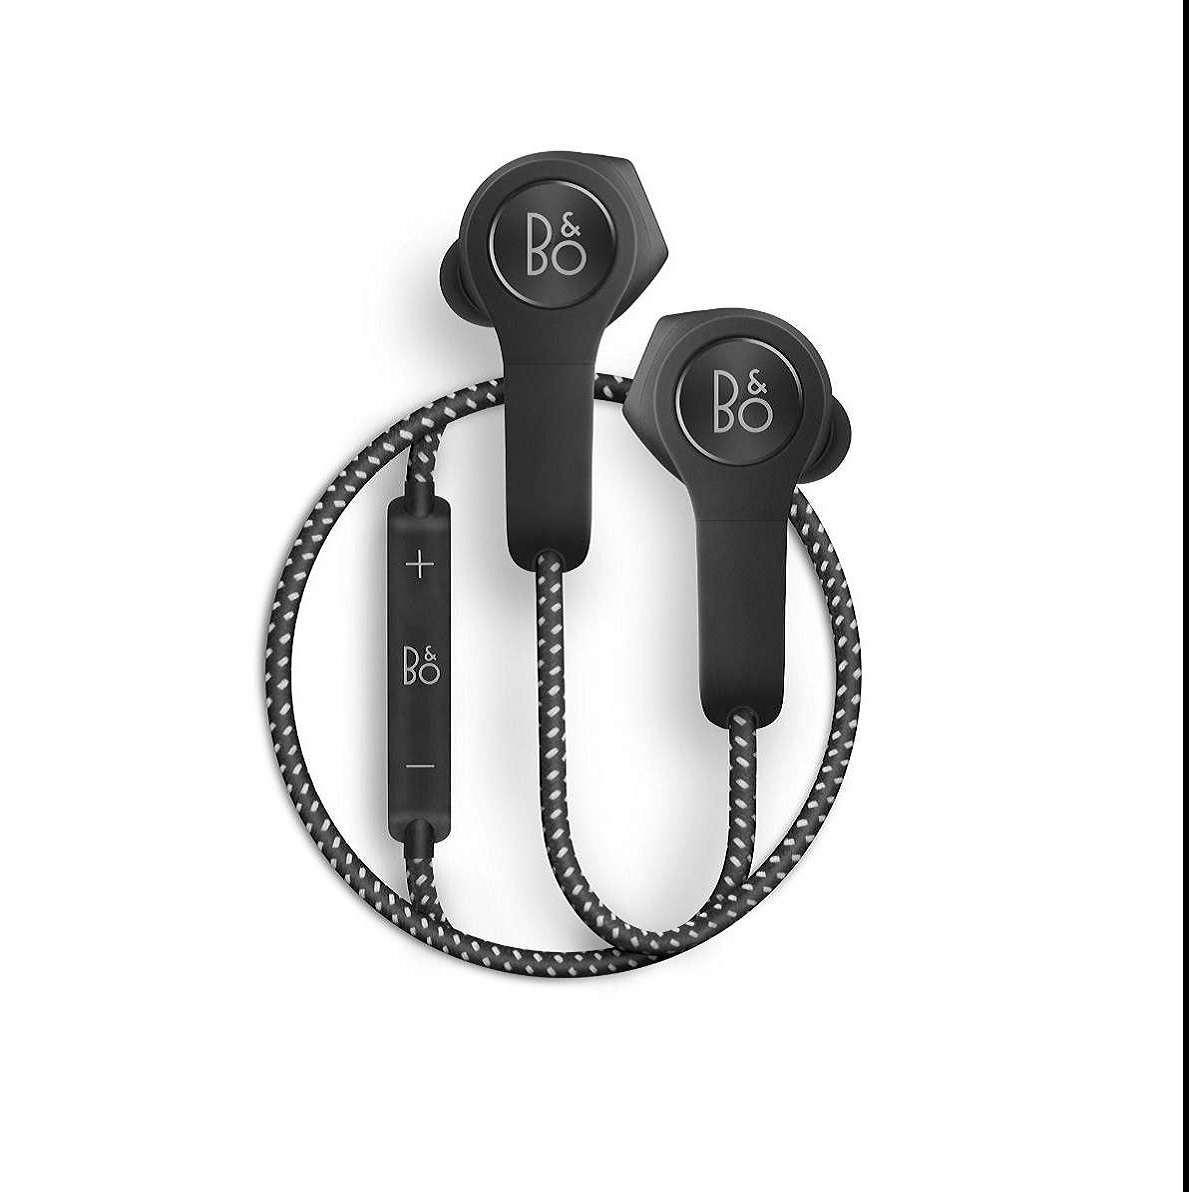 bang olufsen beoplay h5 earphones. Black Bedroom Furniture Sets. Home Design Ideas